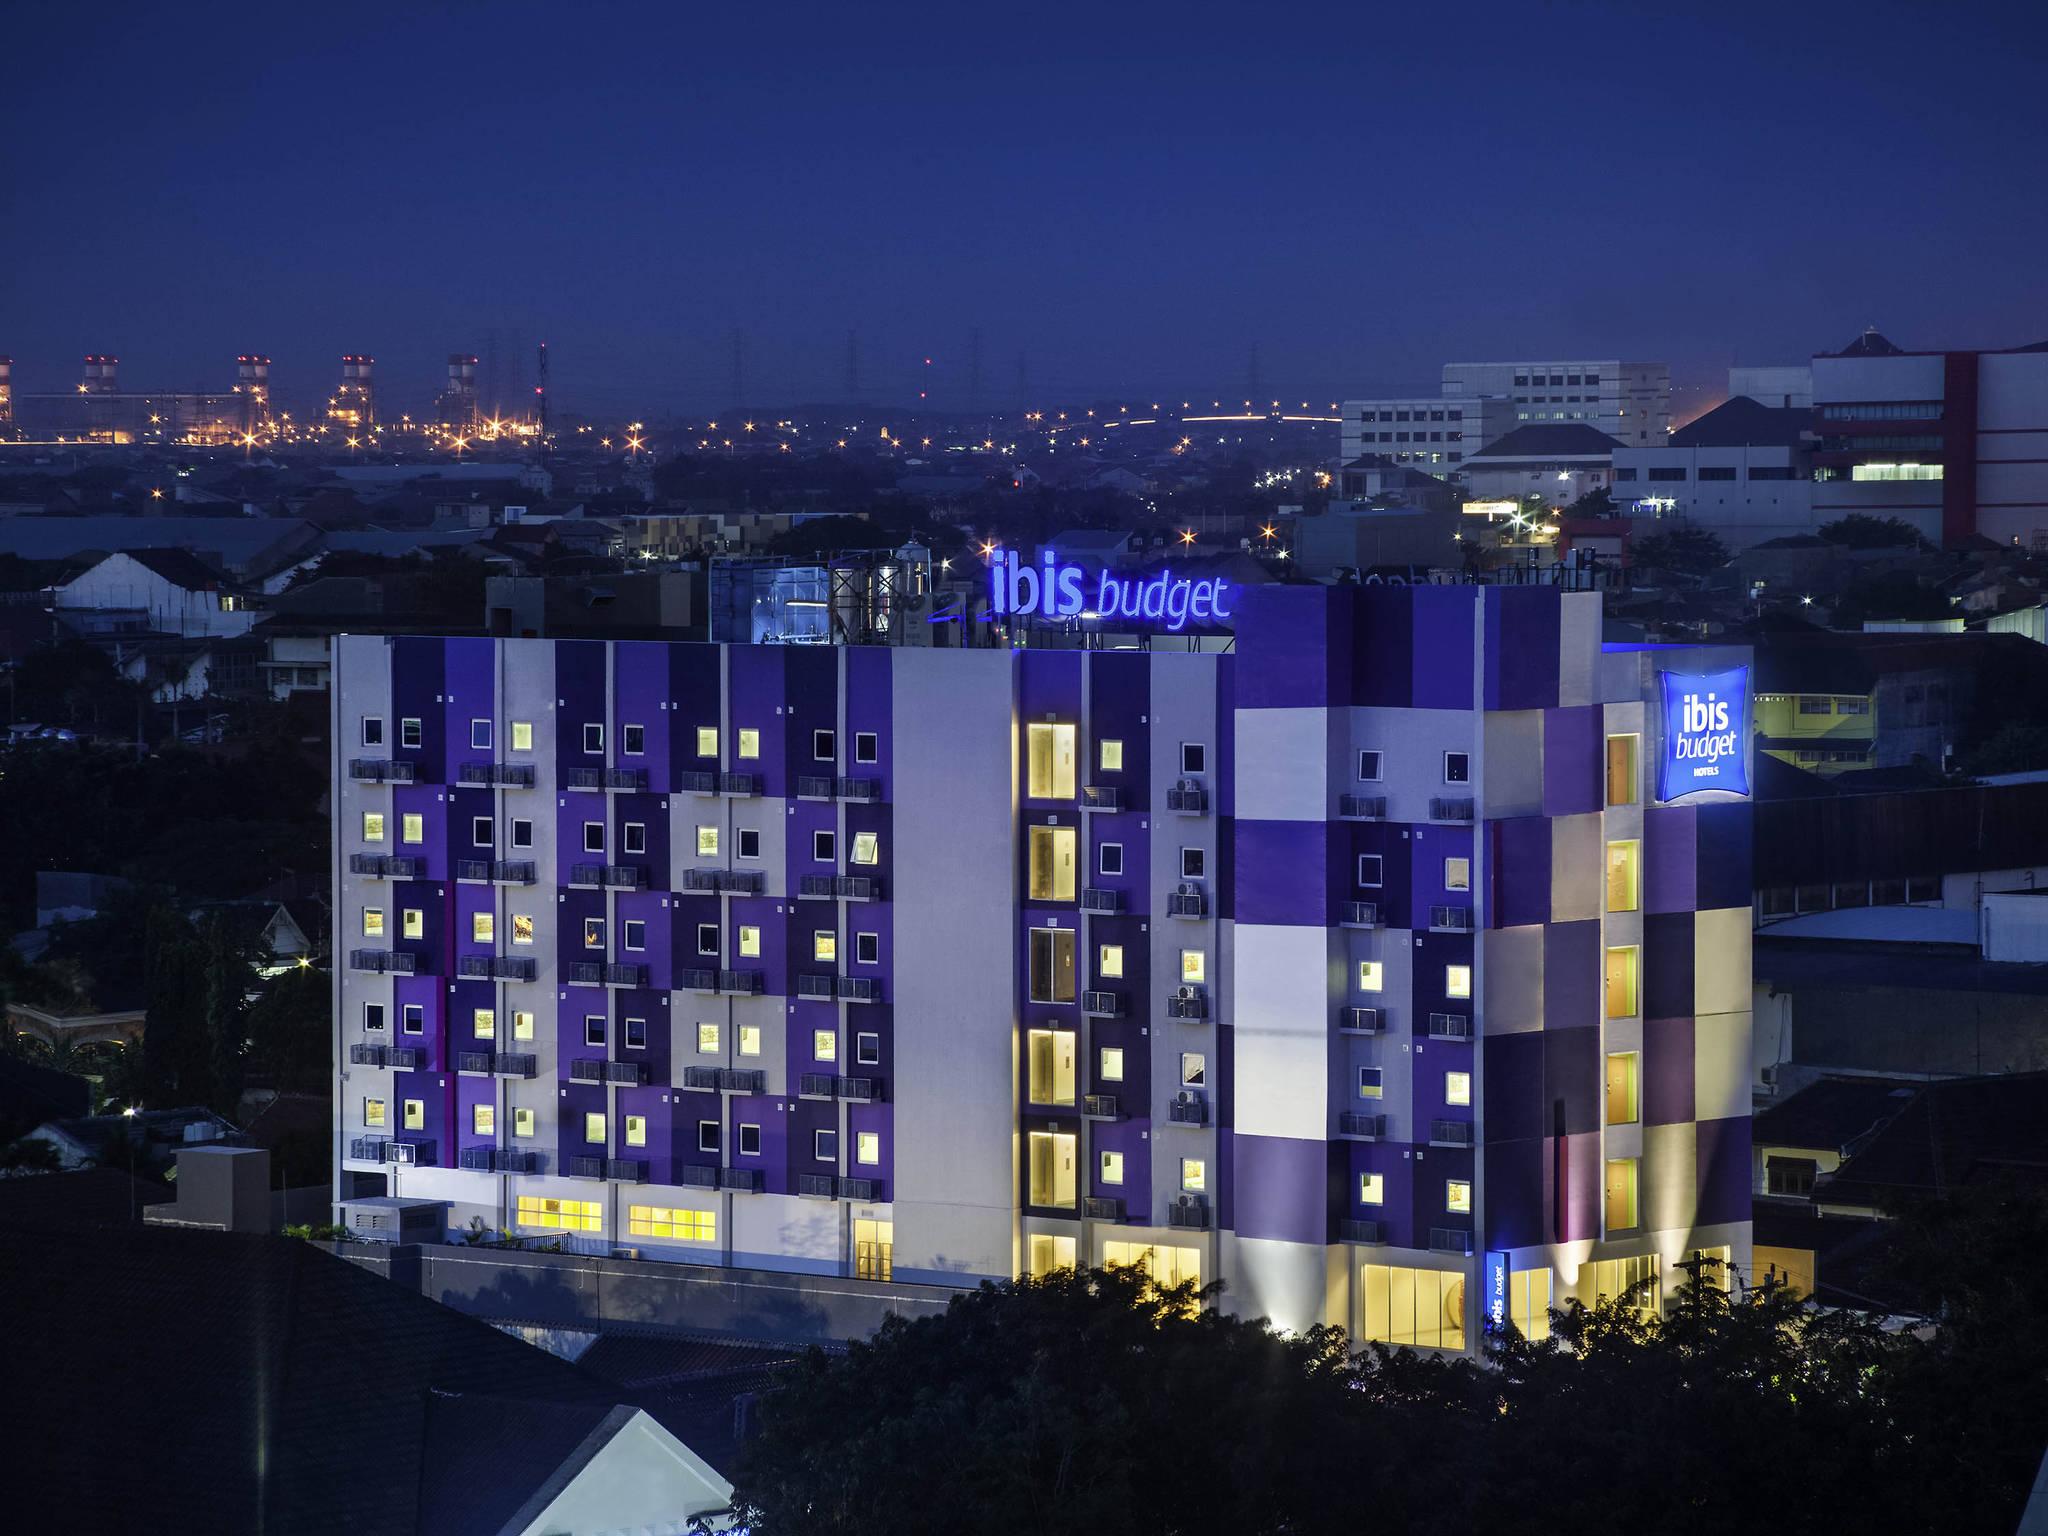 Budget Hotel Ibis Budget Semarang Tendean Accorhotels